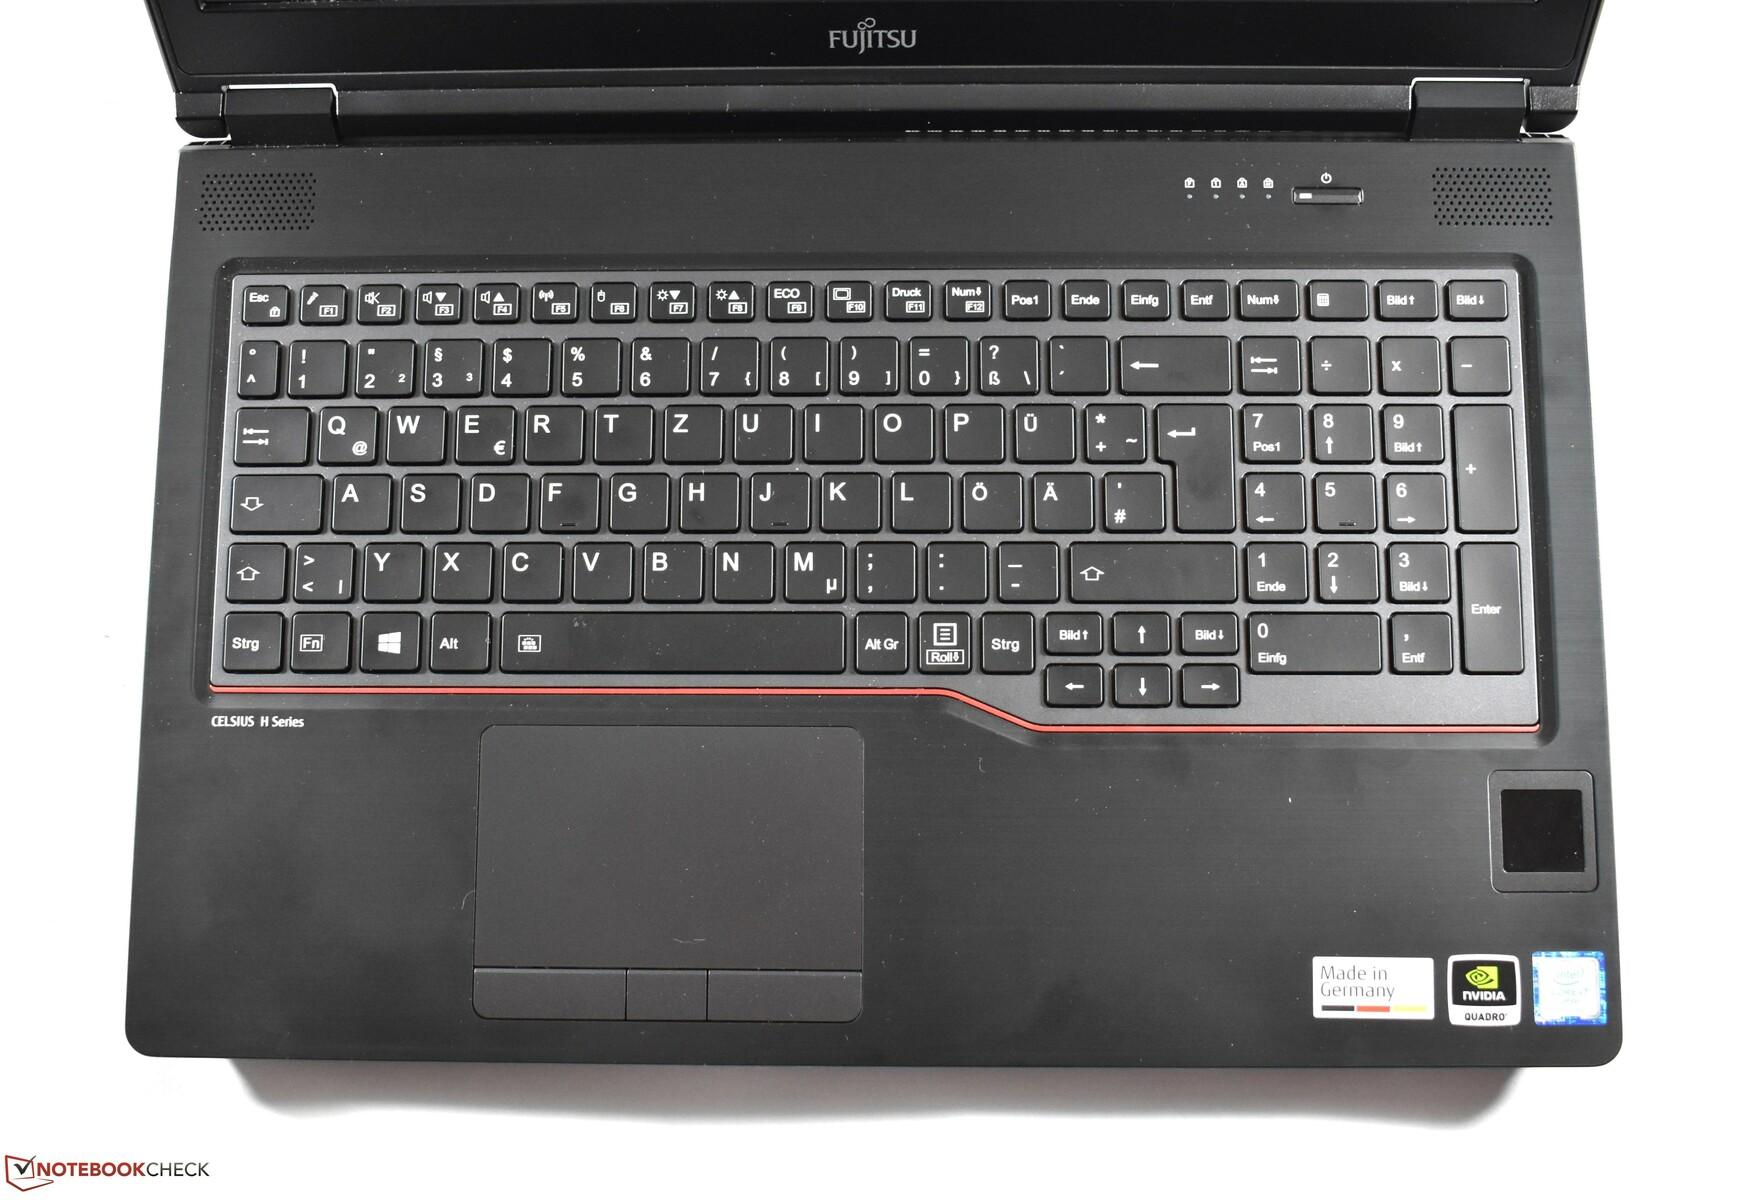 Fujitsu Fp 1000 Driver Free Download